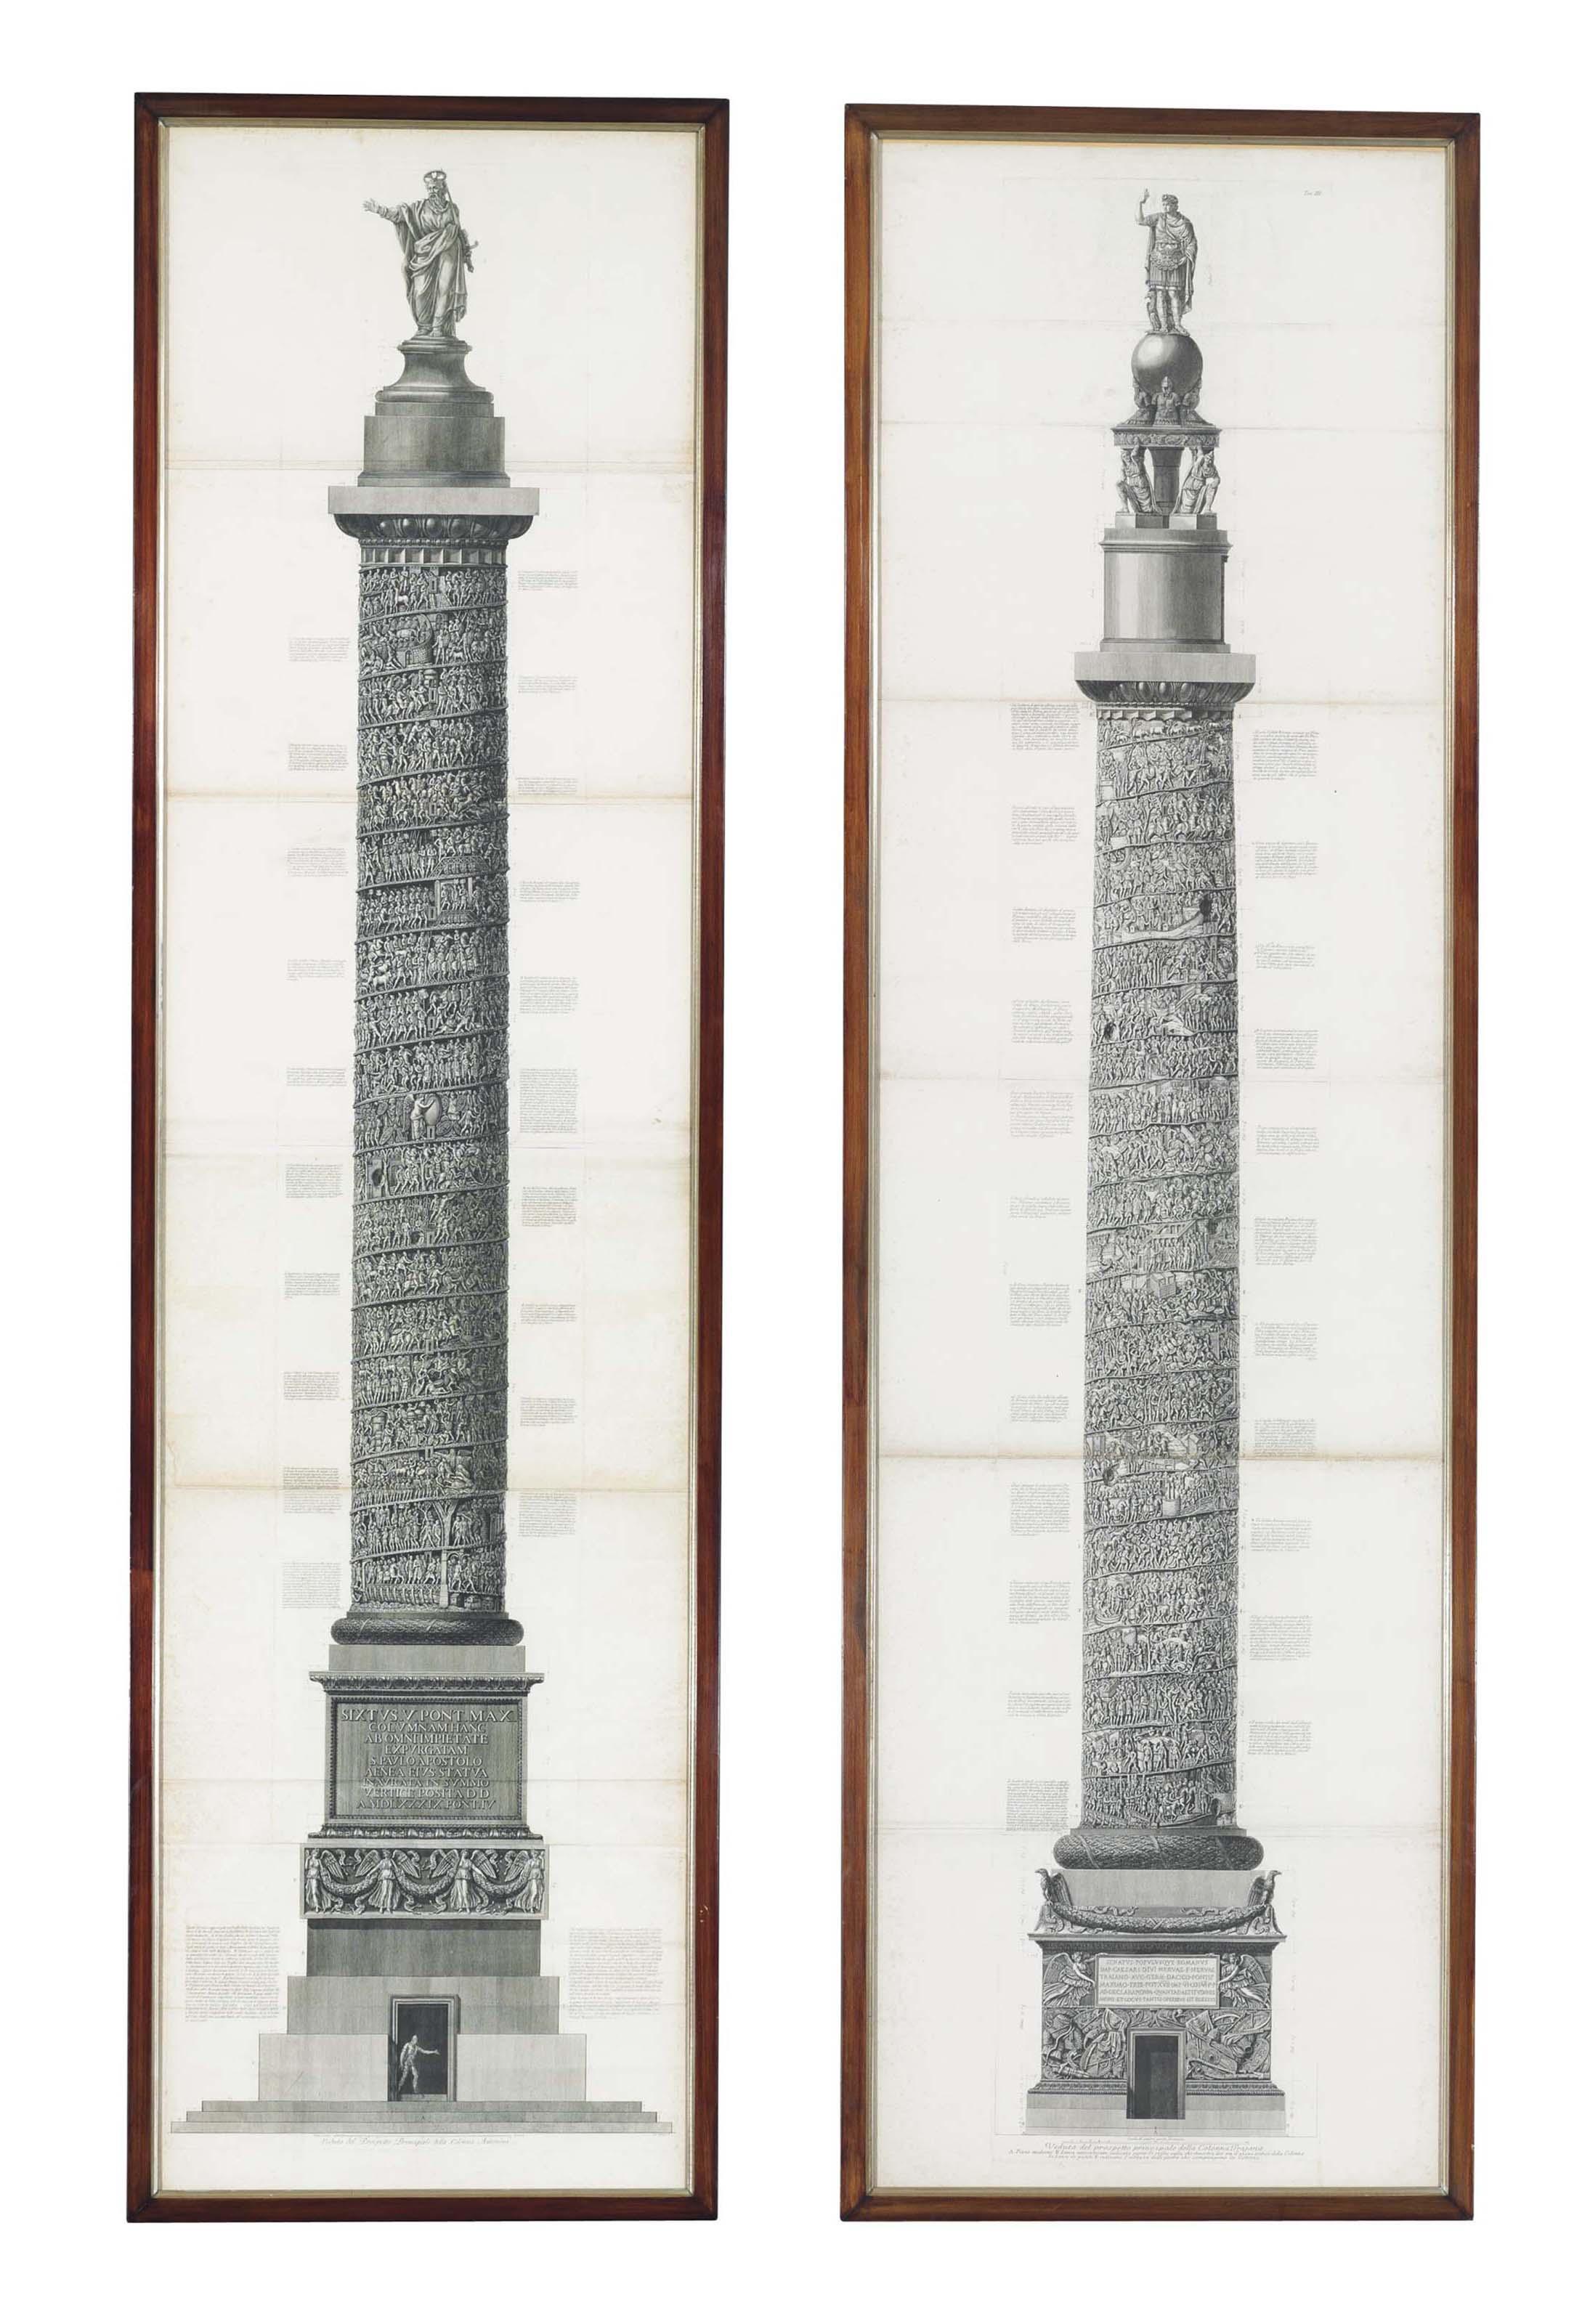 GIOVANNI BATTISTA PIRANESE (1720-1778)